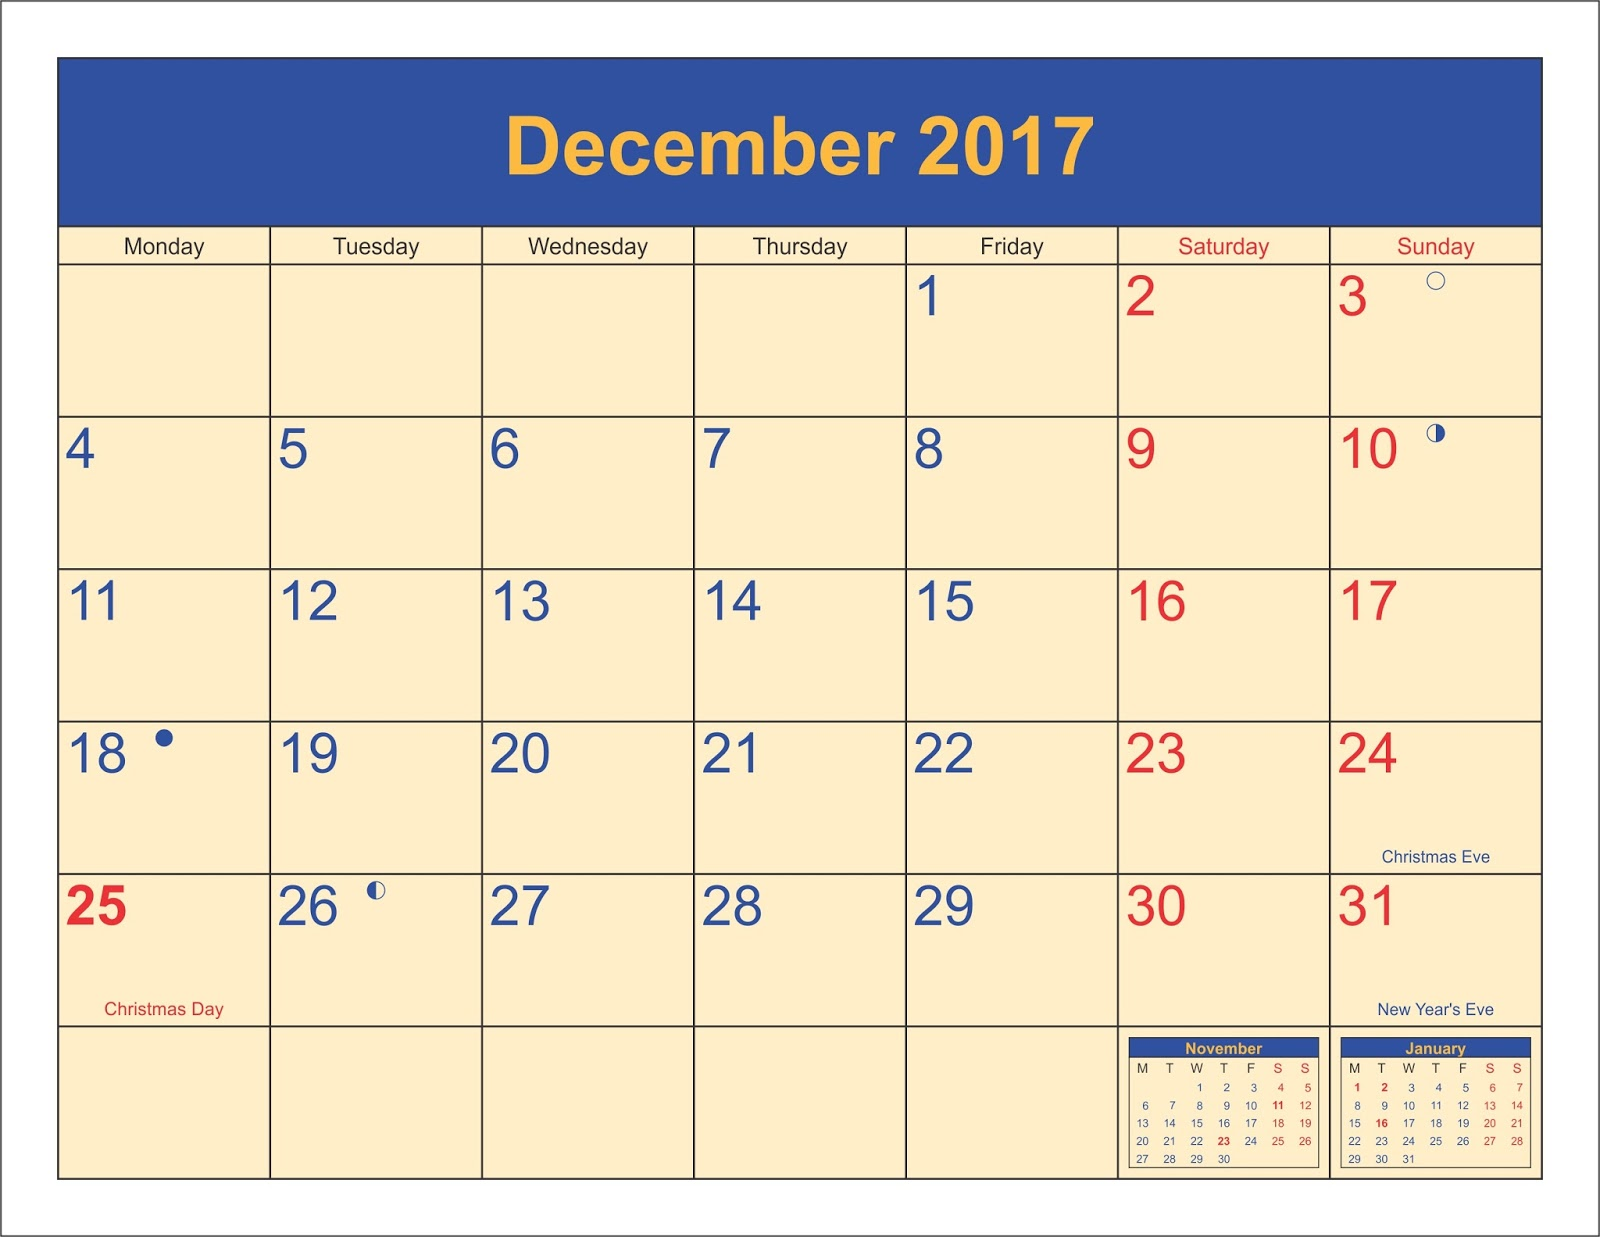 Calendar Templates You Can Type In : Printable calendar by month you can type in autos post